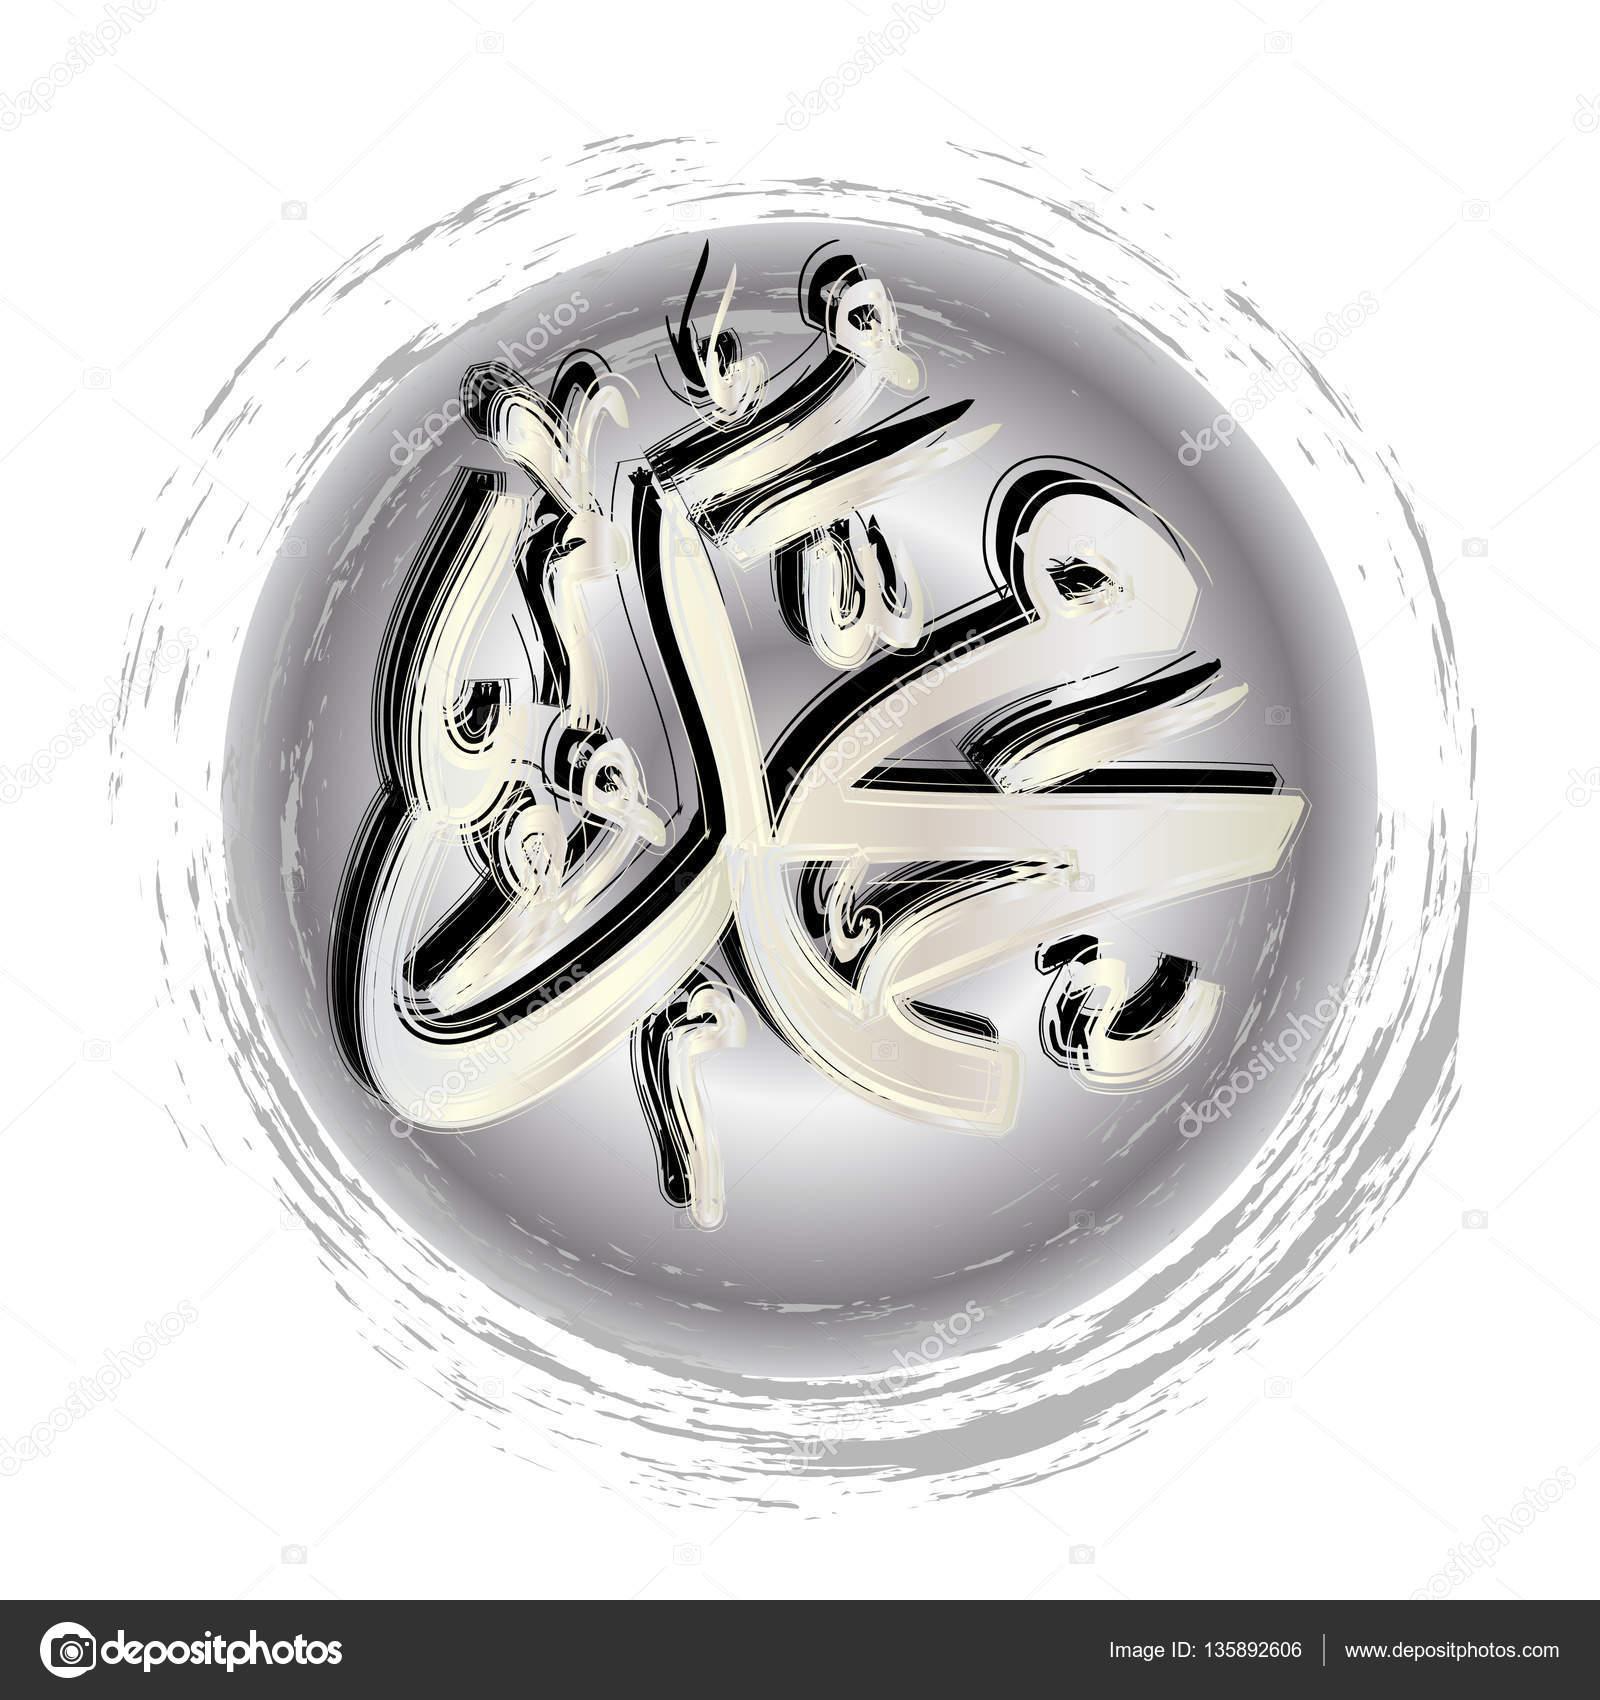 Arabic Calligraphy Translation Name Of The Prophet Muhammad Peace